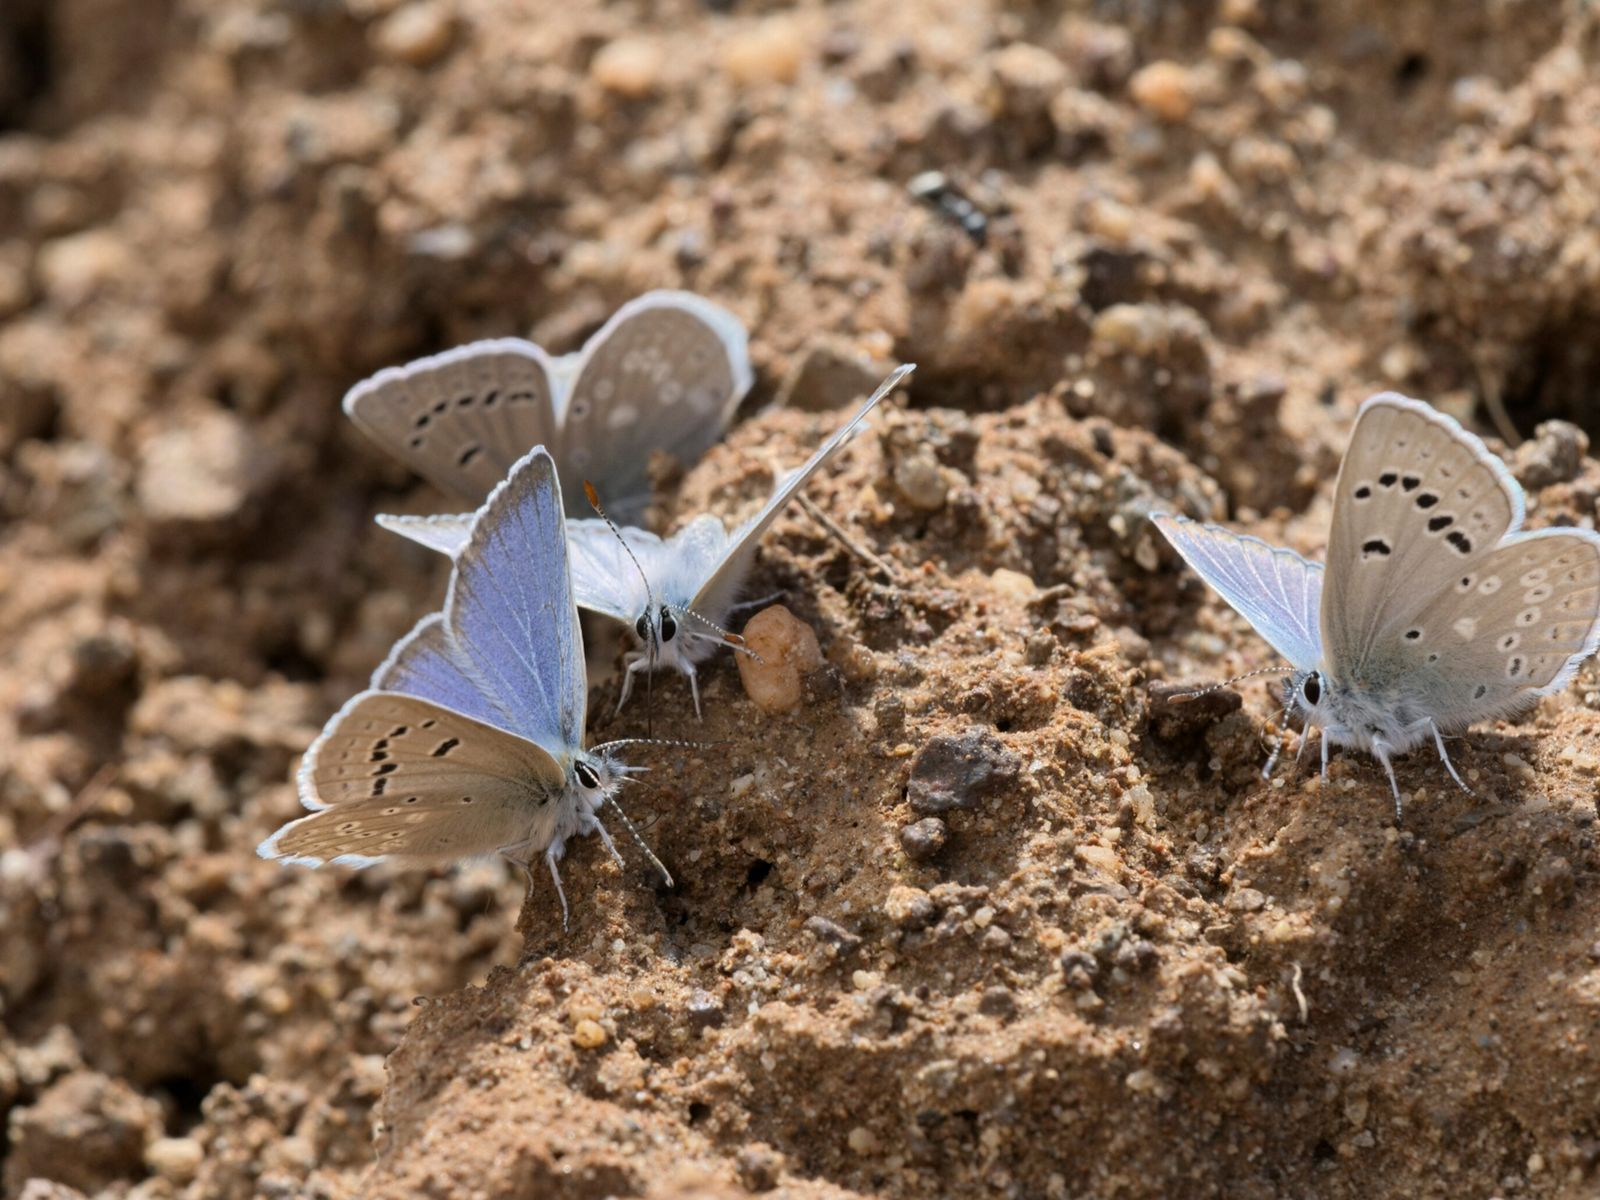 450-butterfly-species-decline-02